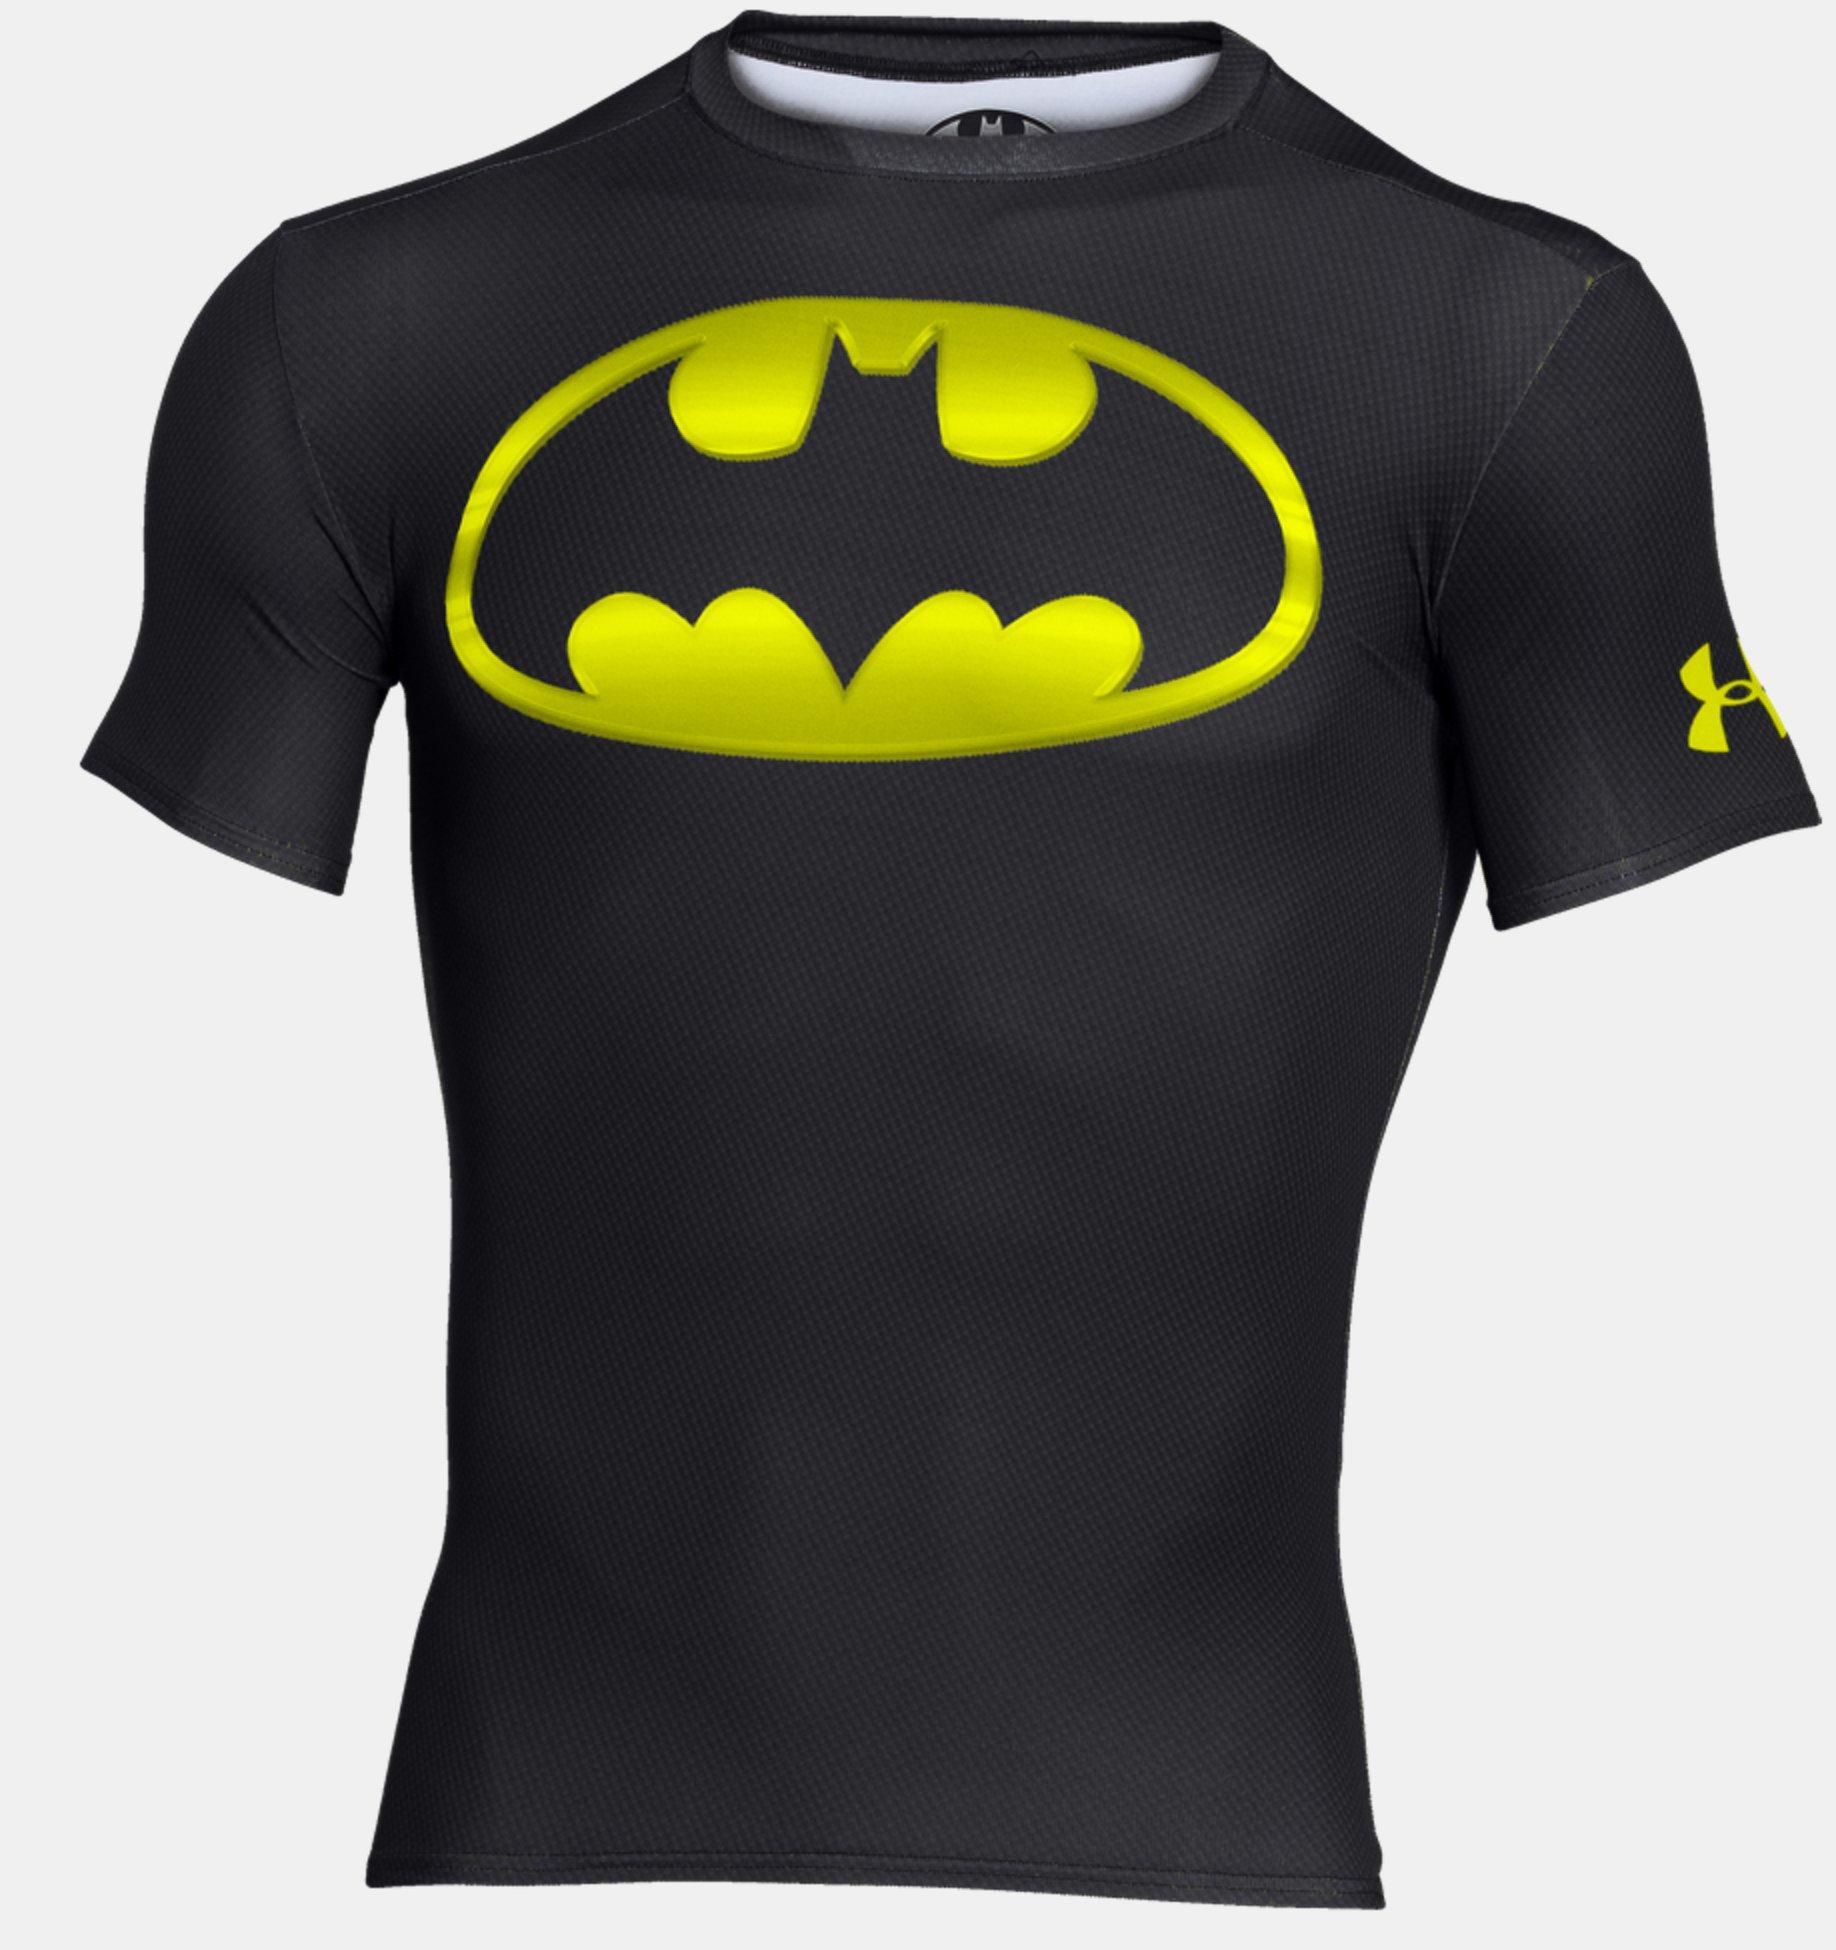 Vellidte Men's Under Armour® Alter Ego Batman Compression Shirt | Under RE-37